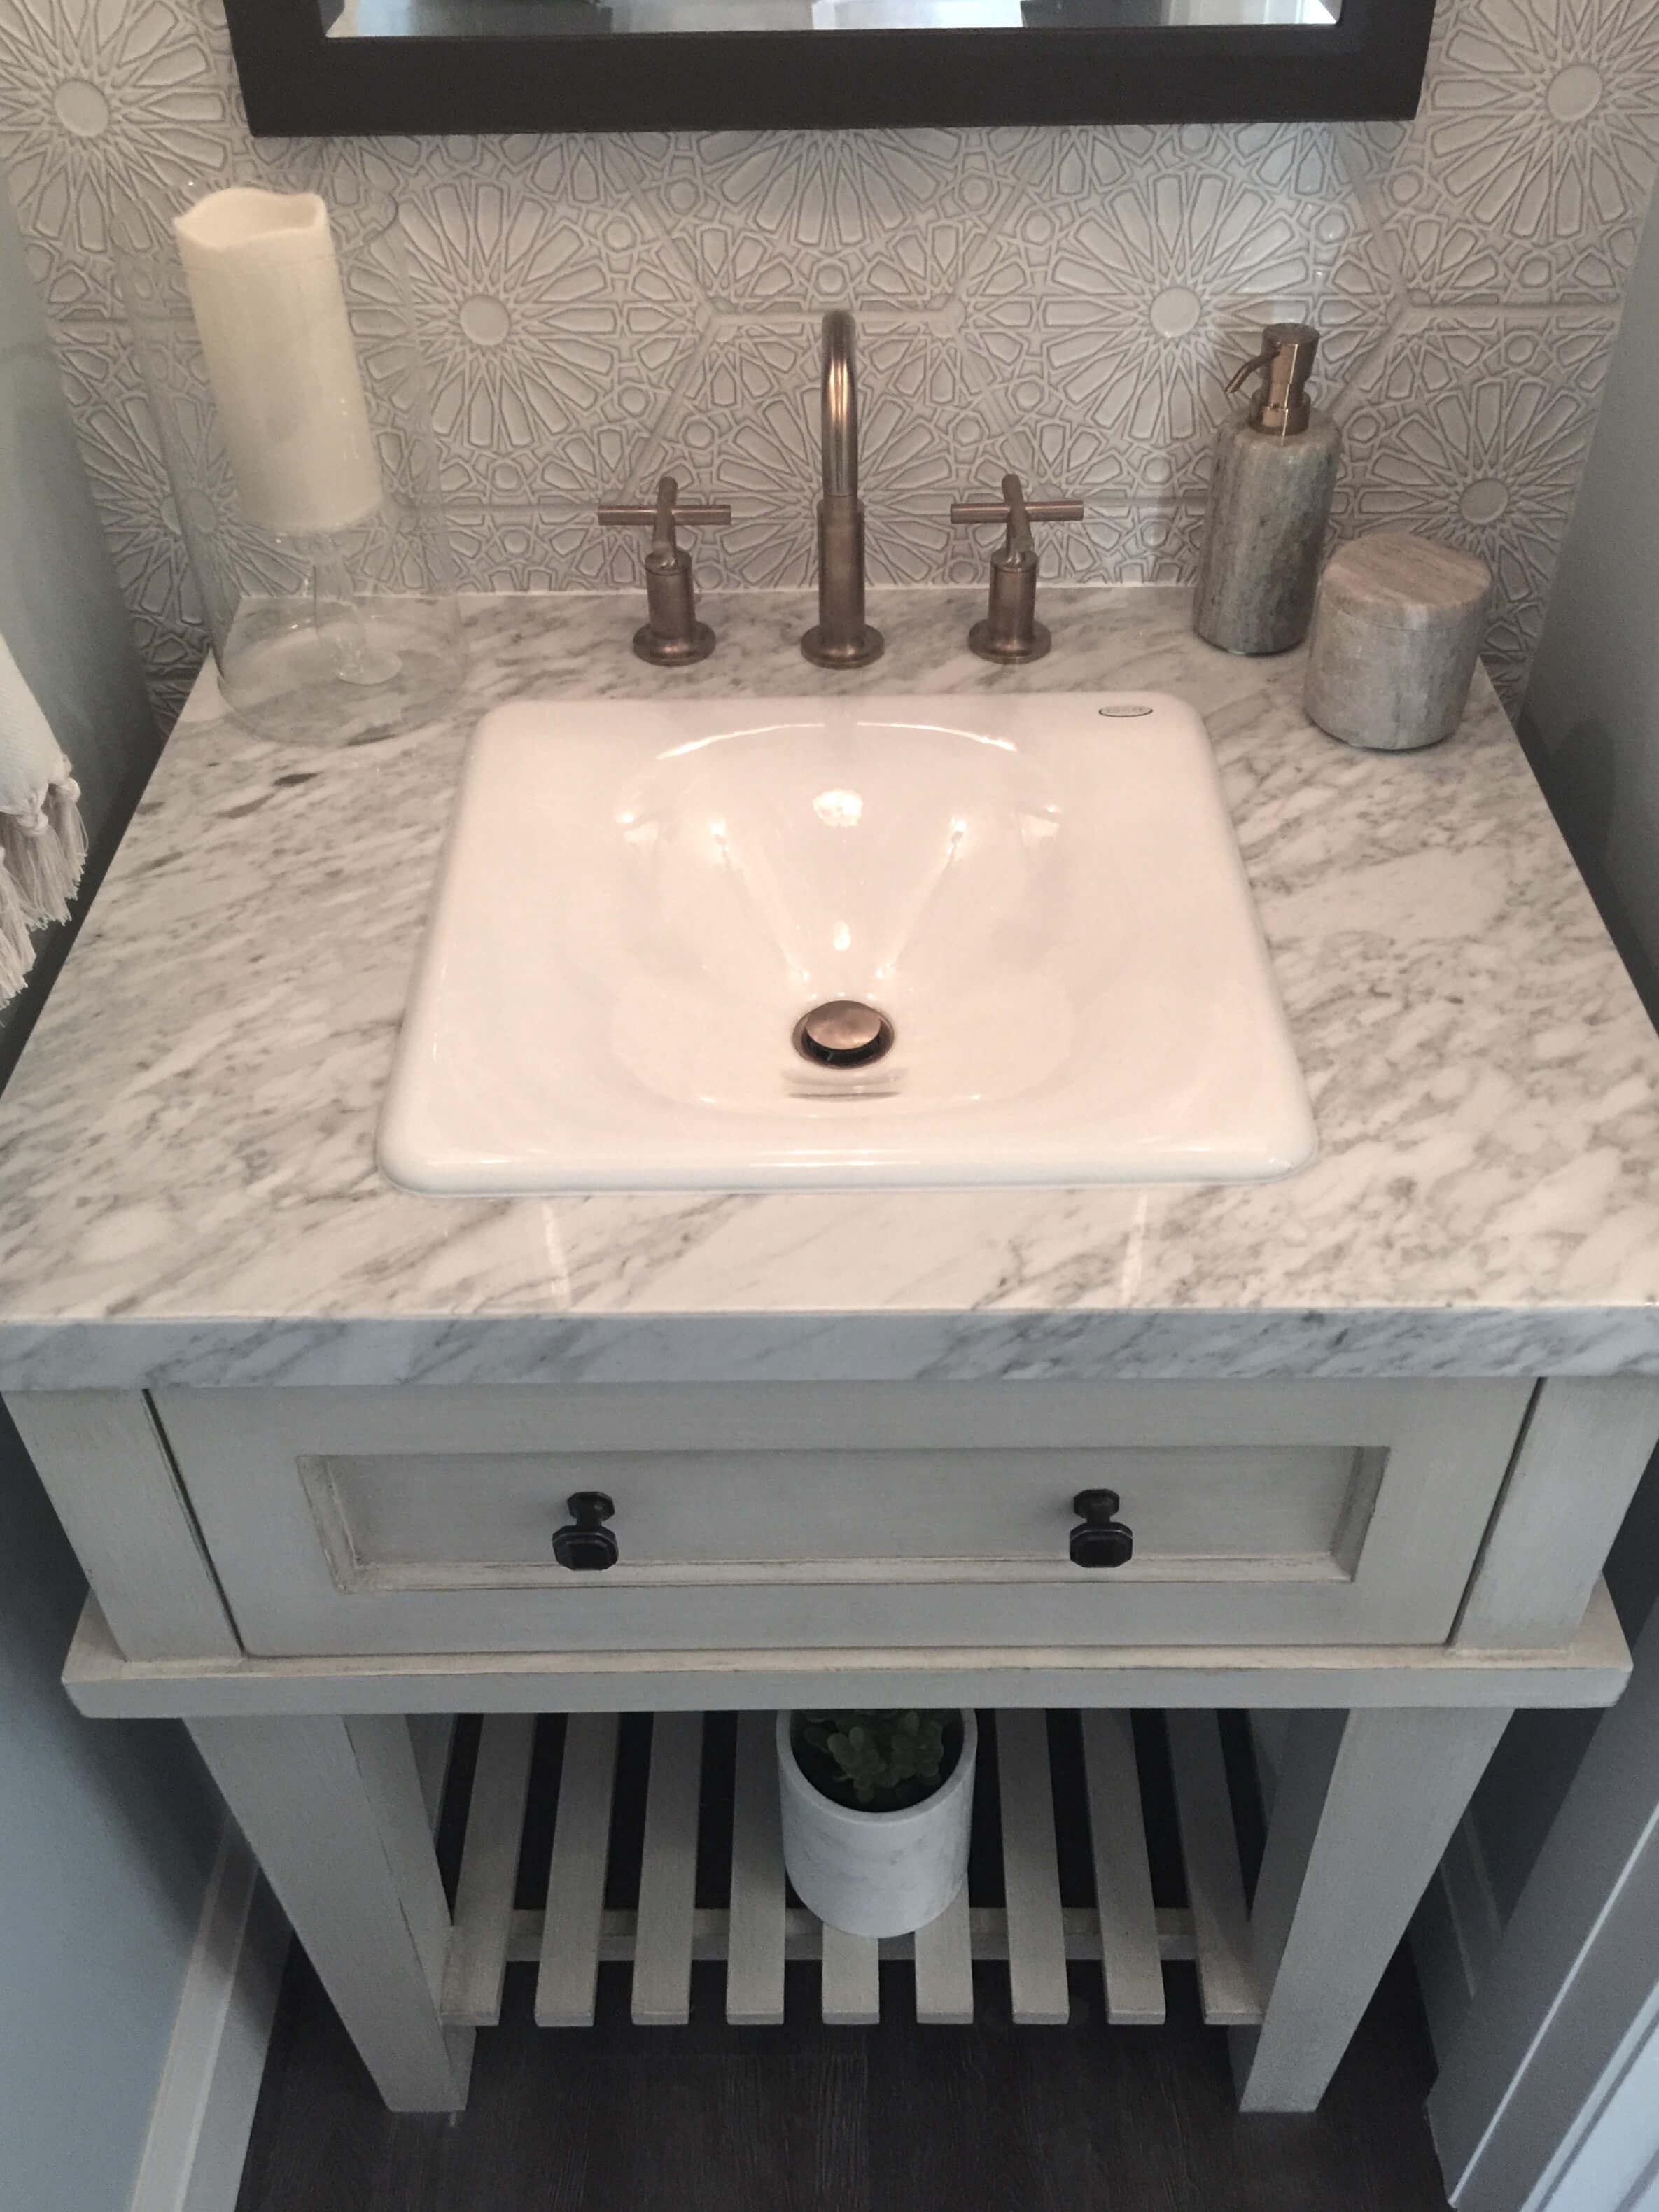 POWDER BATH ROUND UP |Powder bath with textured look tile wall in Guest House | Designer:  Latrice Gentry Brooks,  Chiffon Interiors, Seen at  ASID Showhouse 2017  #powderbath #powderroom